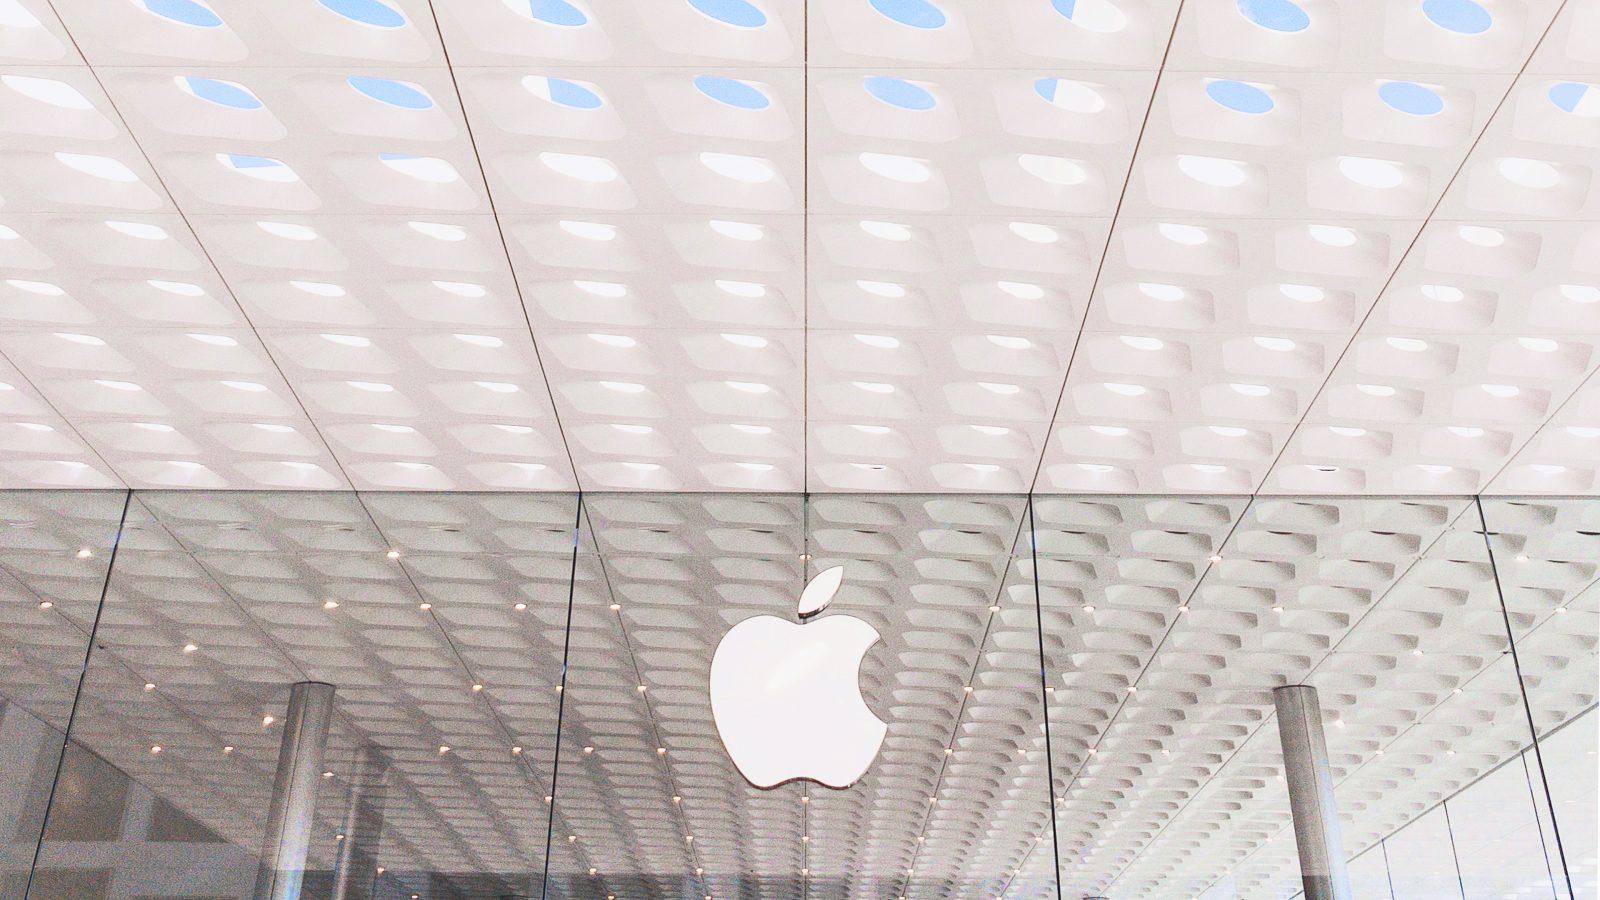 Retail Marathon: Apple Stores Open in Scottsdale, Deer Park, Lehigh Valley, Green Hills, Robina